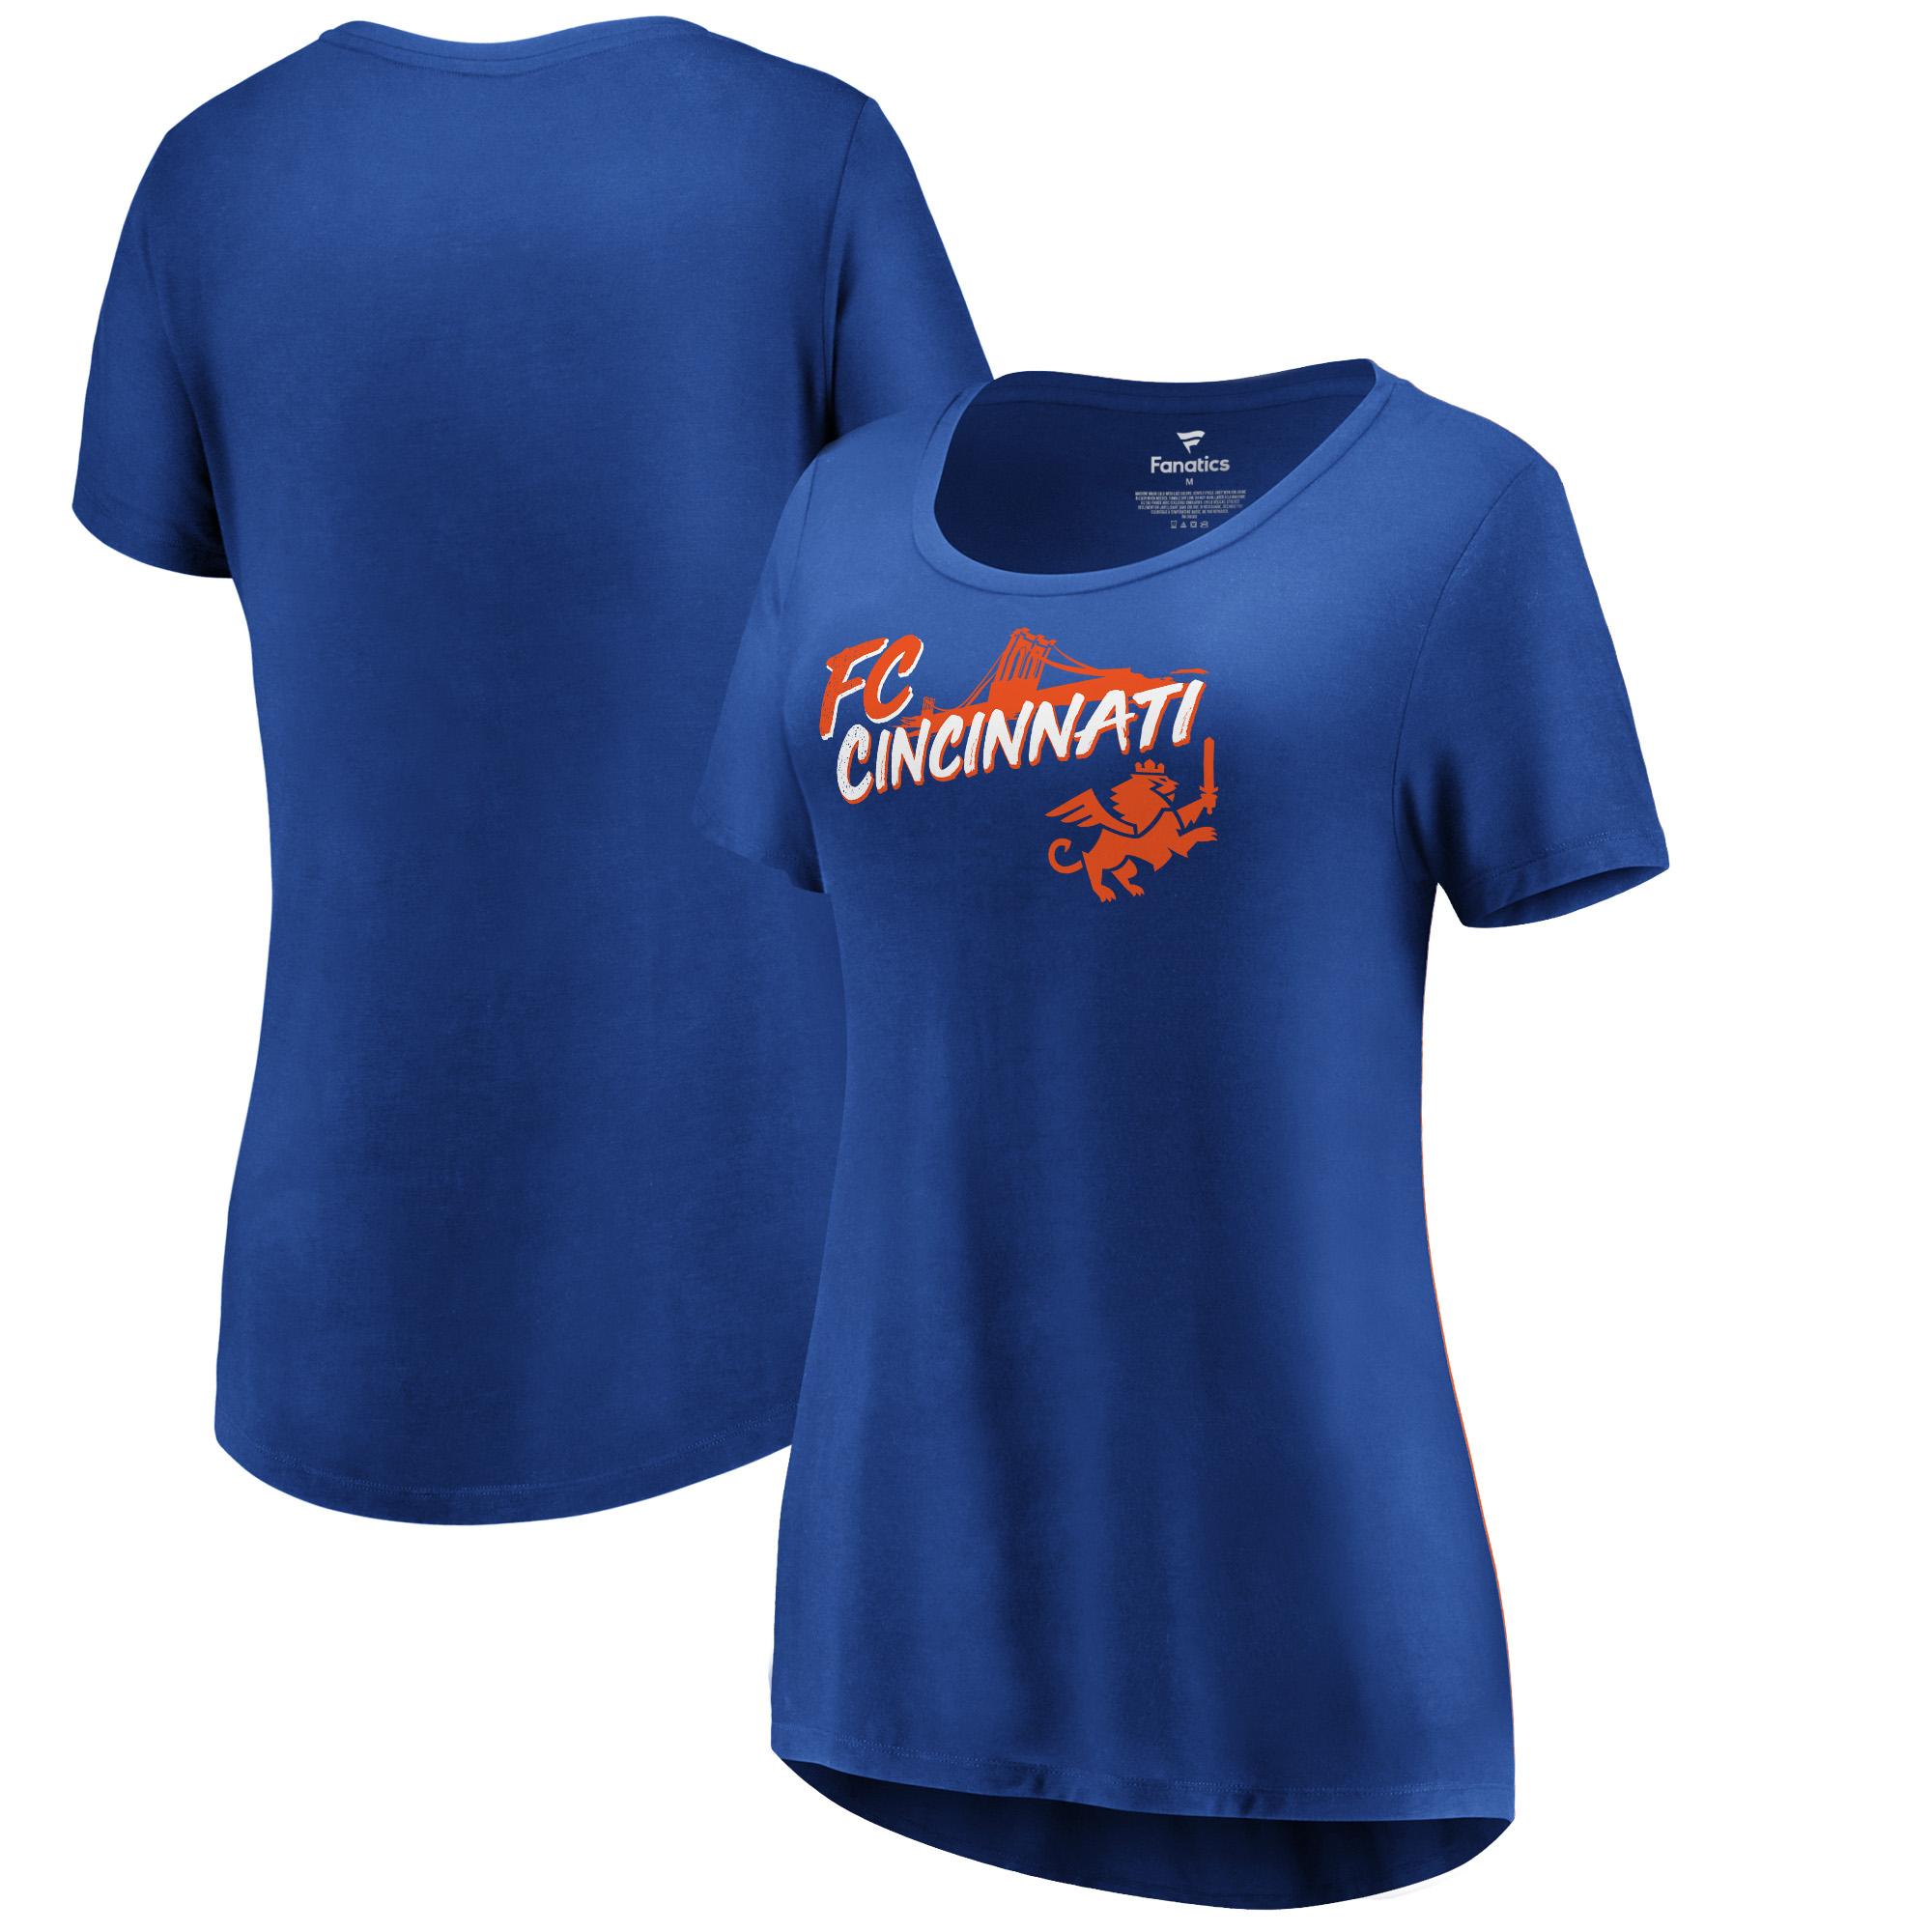 FC Cincinnati Fanatics Branded Women's Roebling T-Shirt - Royal